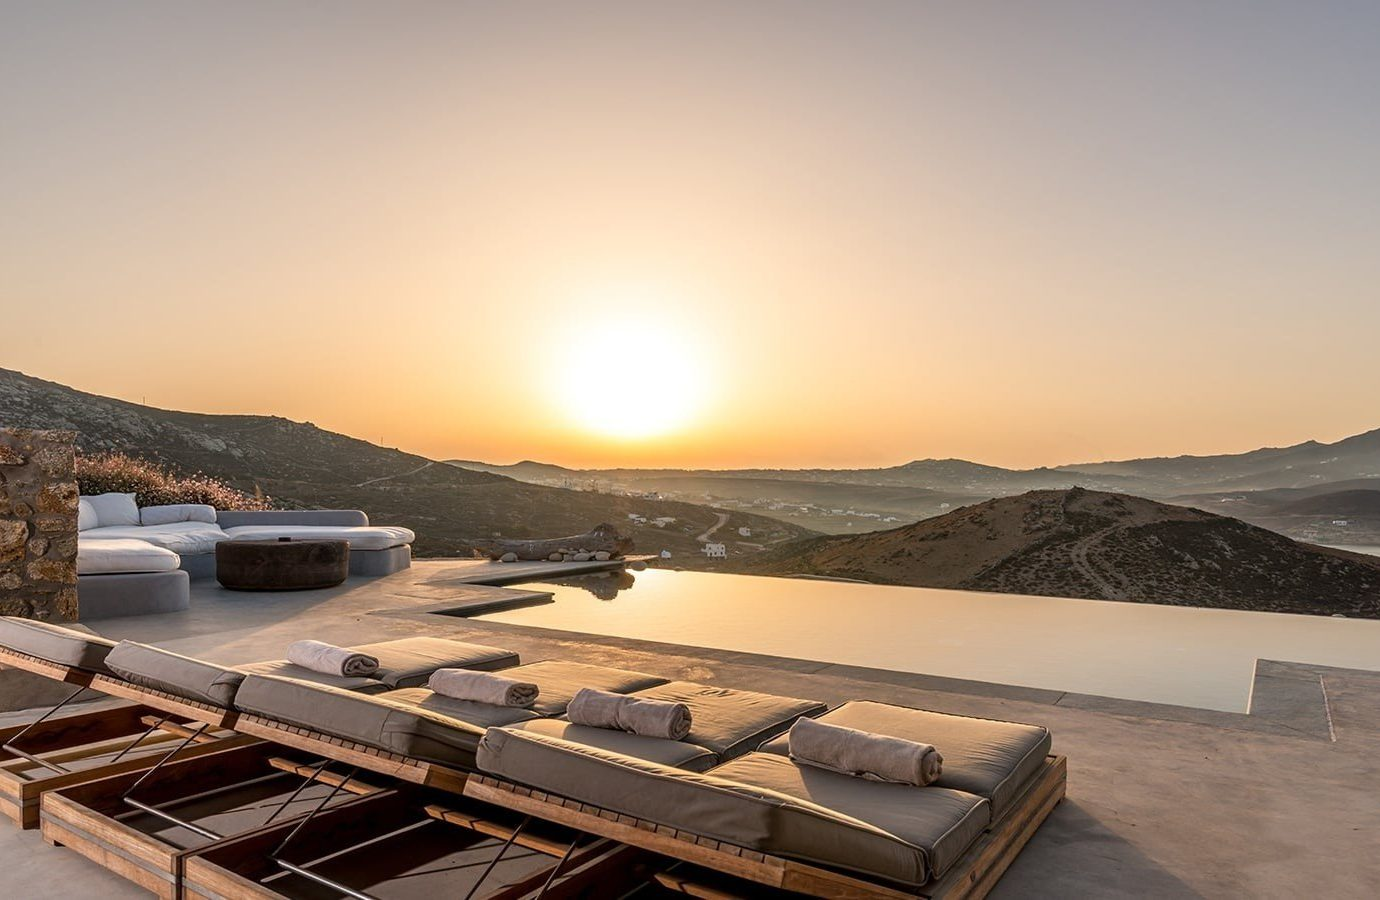 Hotels Luxury Travel sky outdoor property morning real estate roof sunlight sunrise landscape horizon dawn Sunset evening